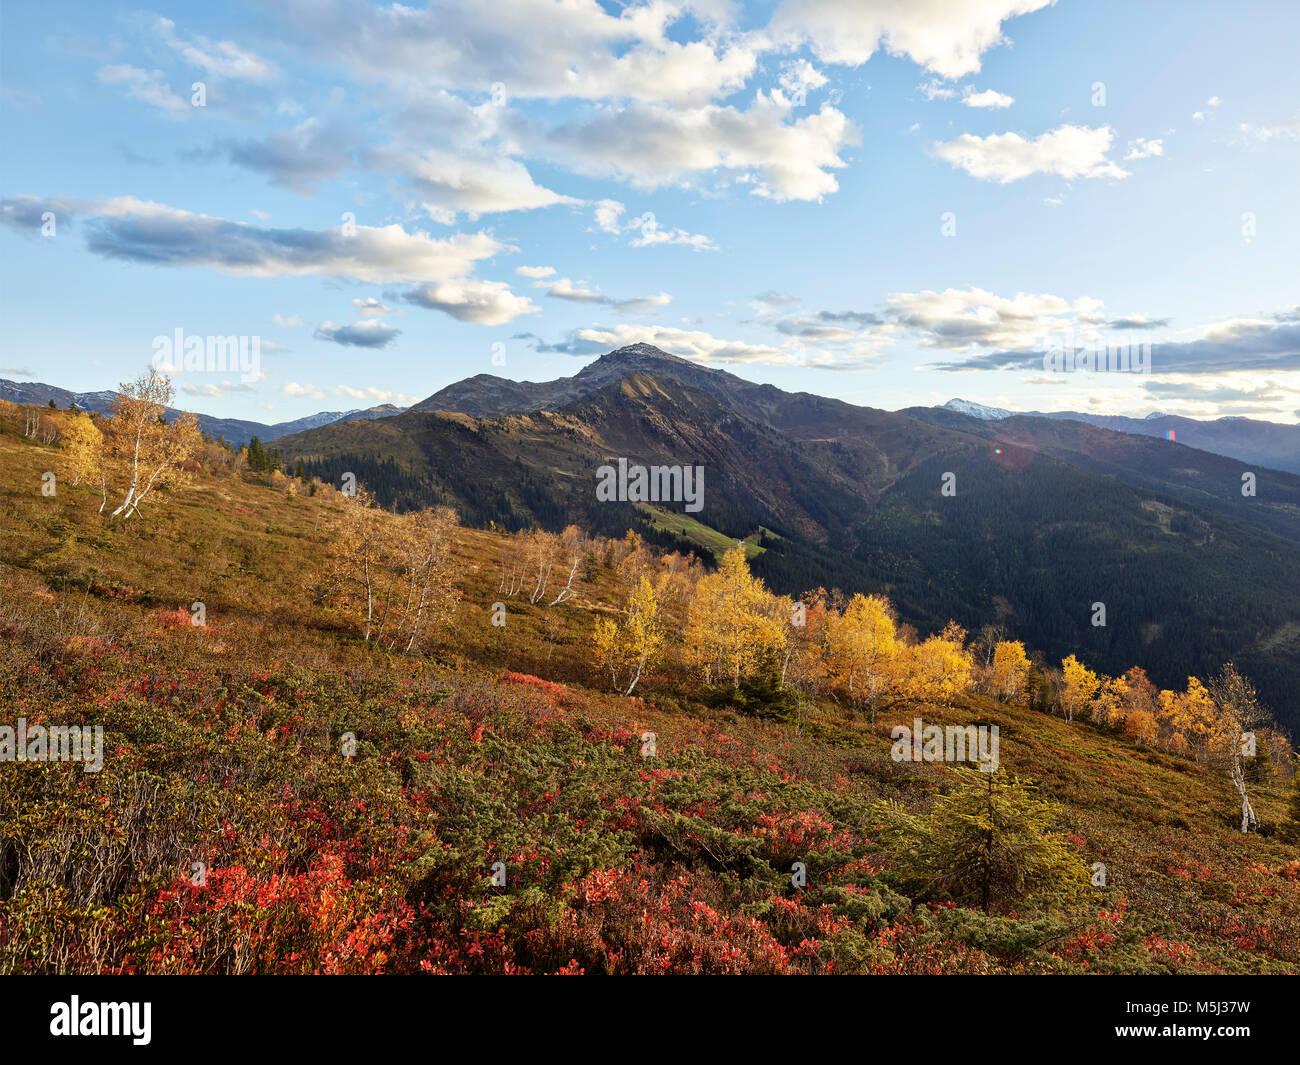 austria, Tyrol, Tux Alps, Schwaz, Gilfert, landscape in autumn - Stock Image